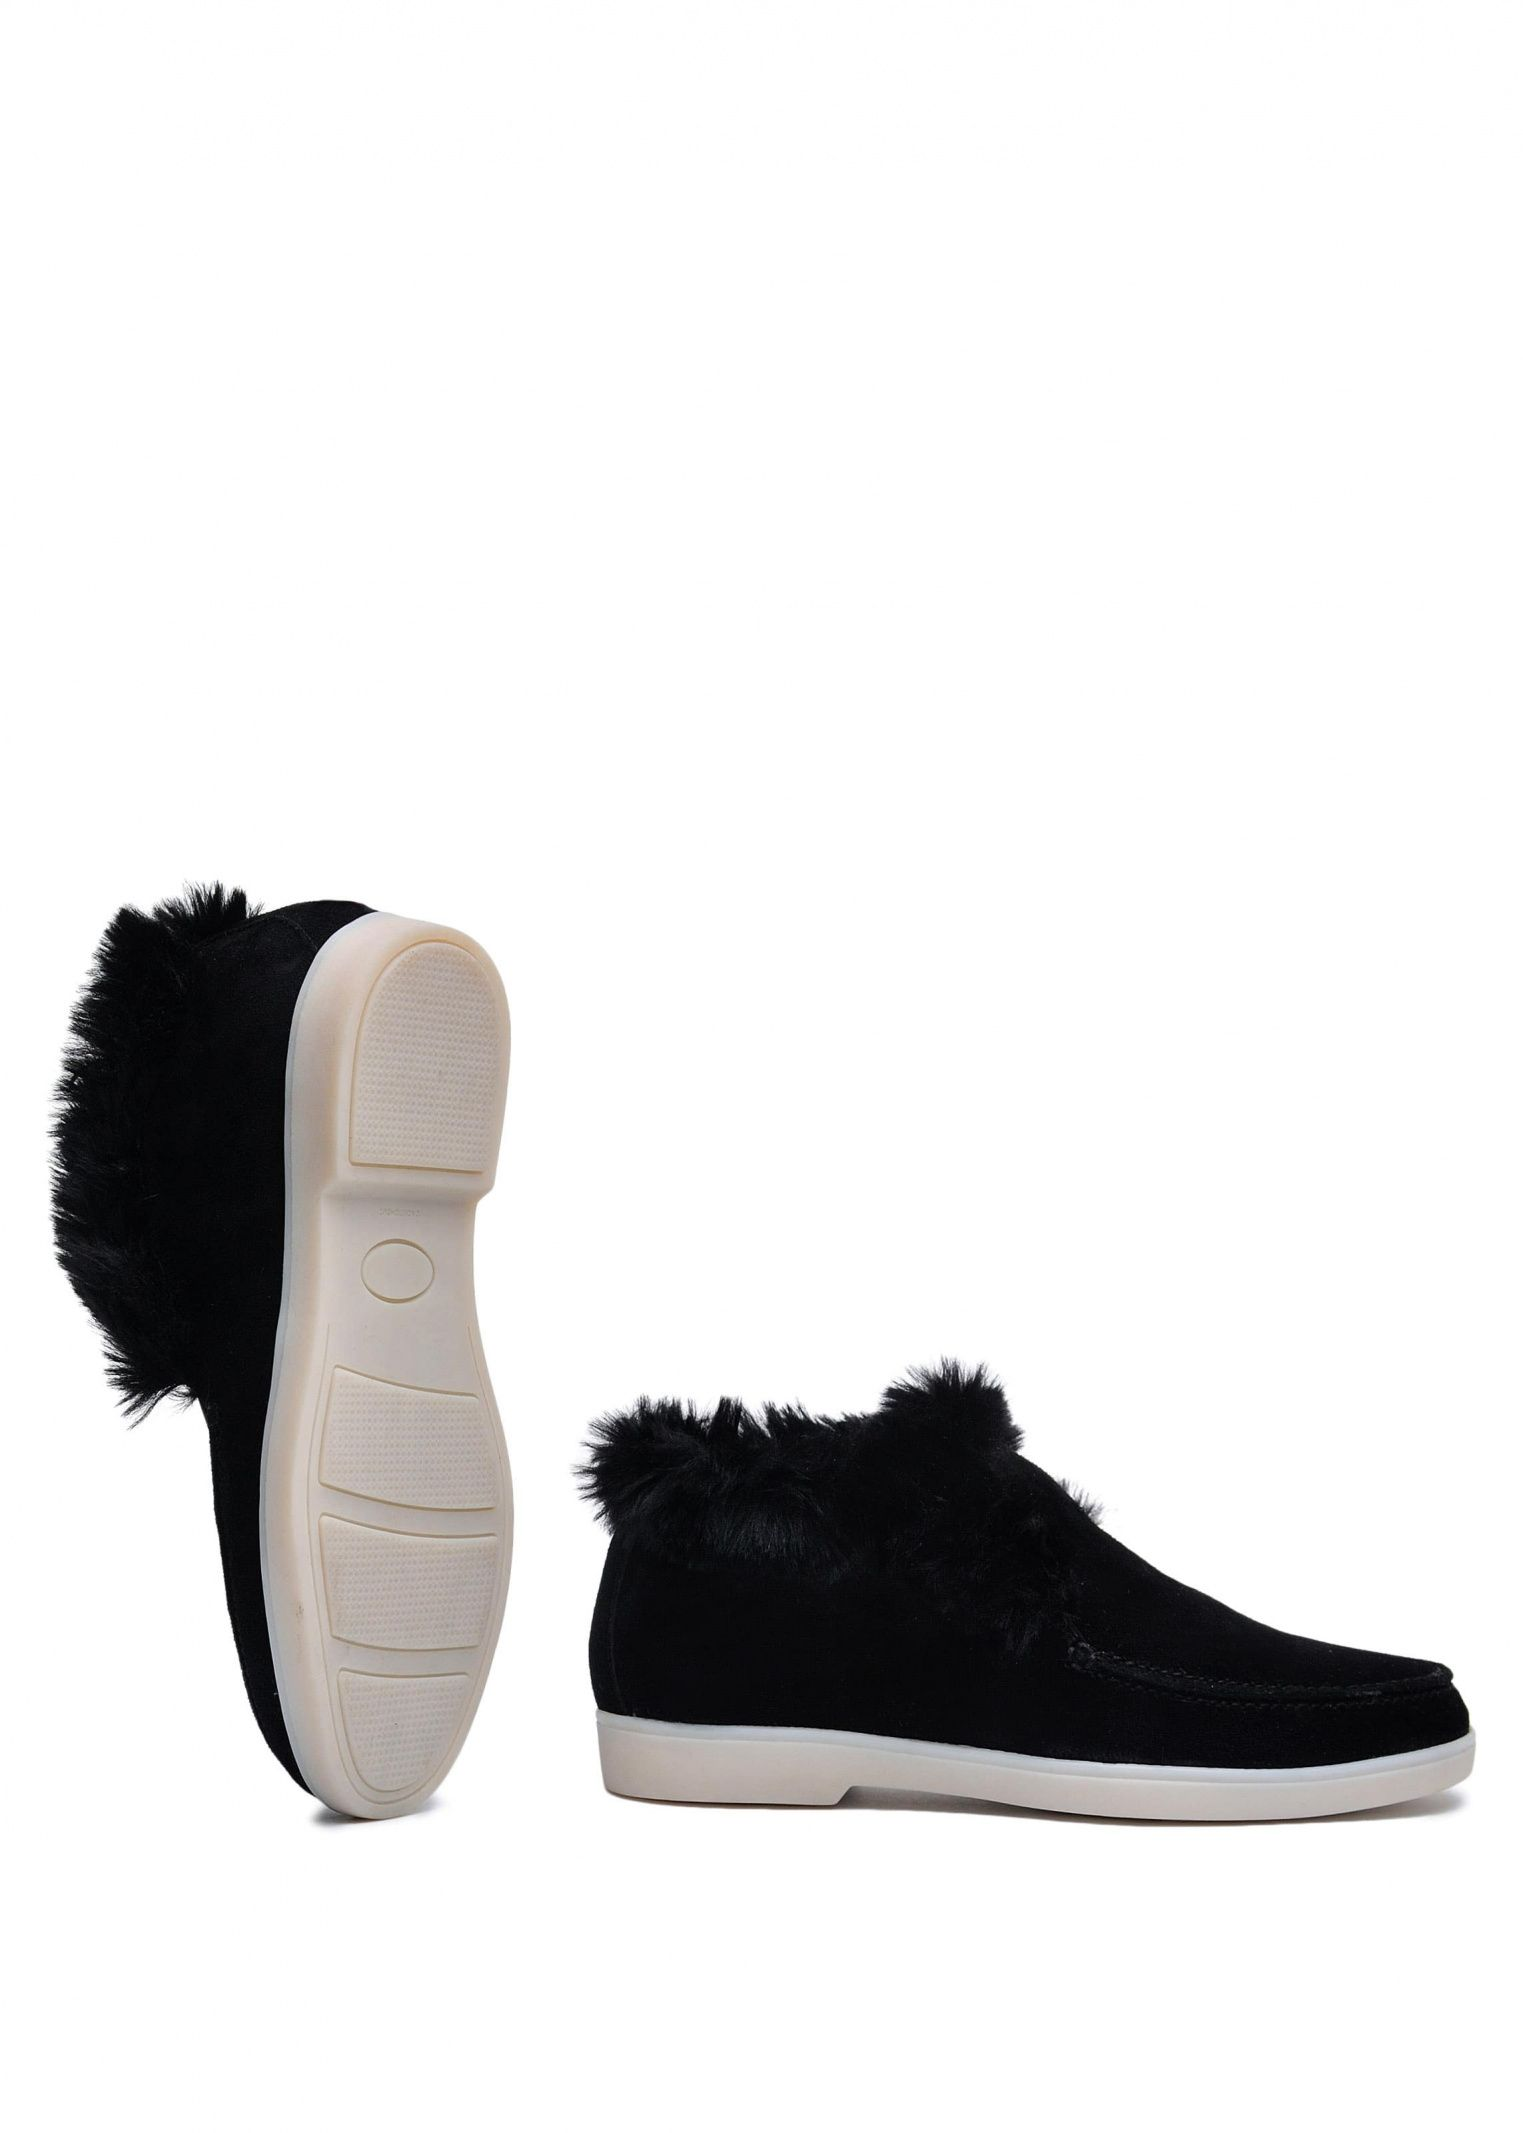 Черевики  жіночі 329931 Замшевые черные ботинки на меху Modus Vivendi 329931 вибрати, 2017